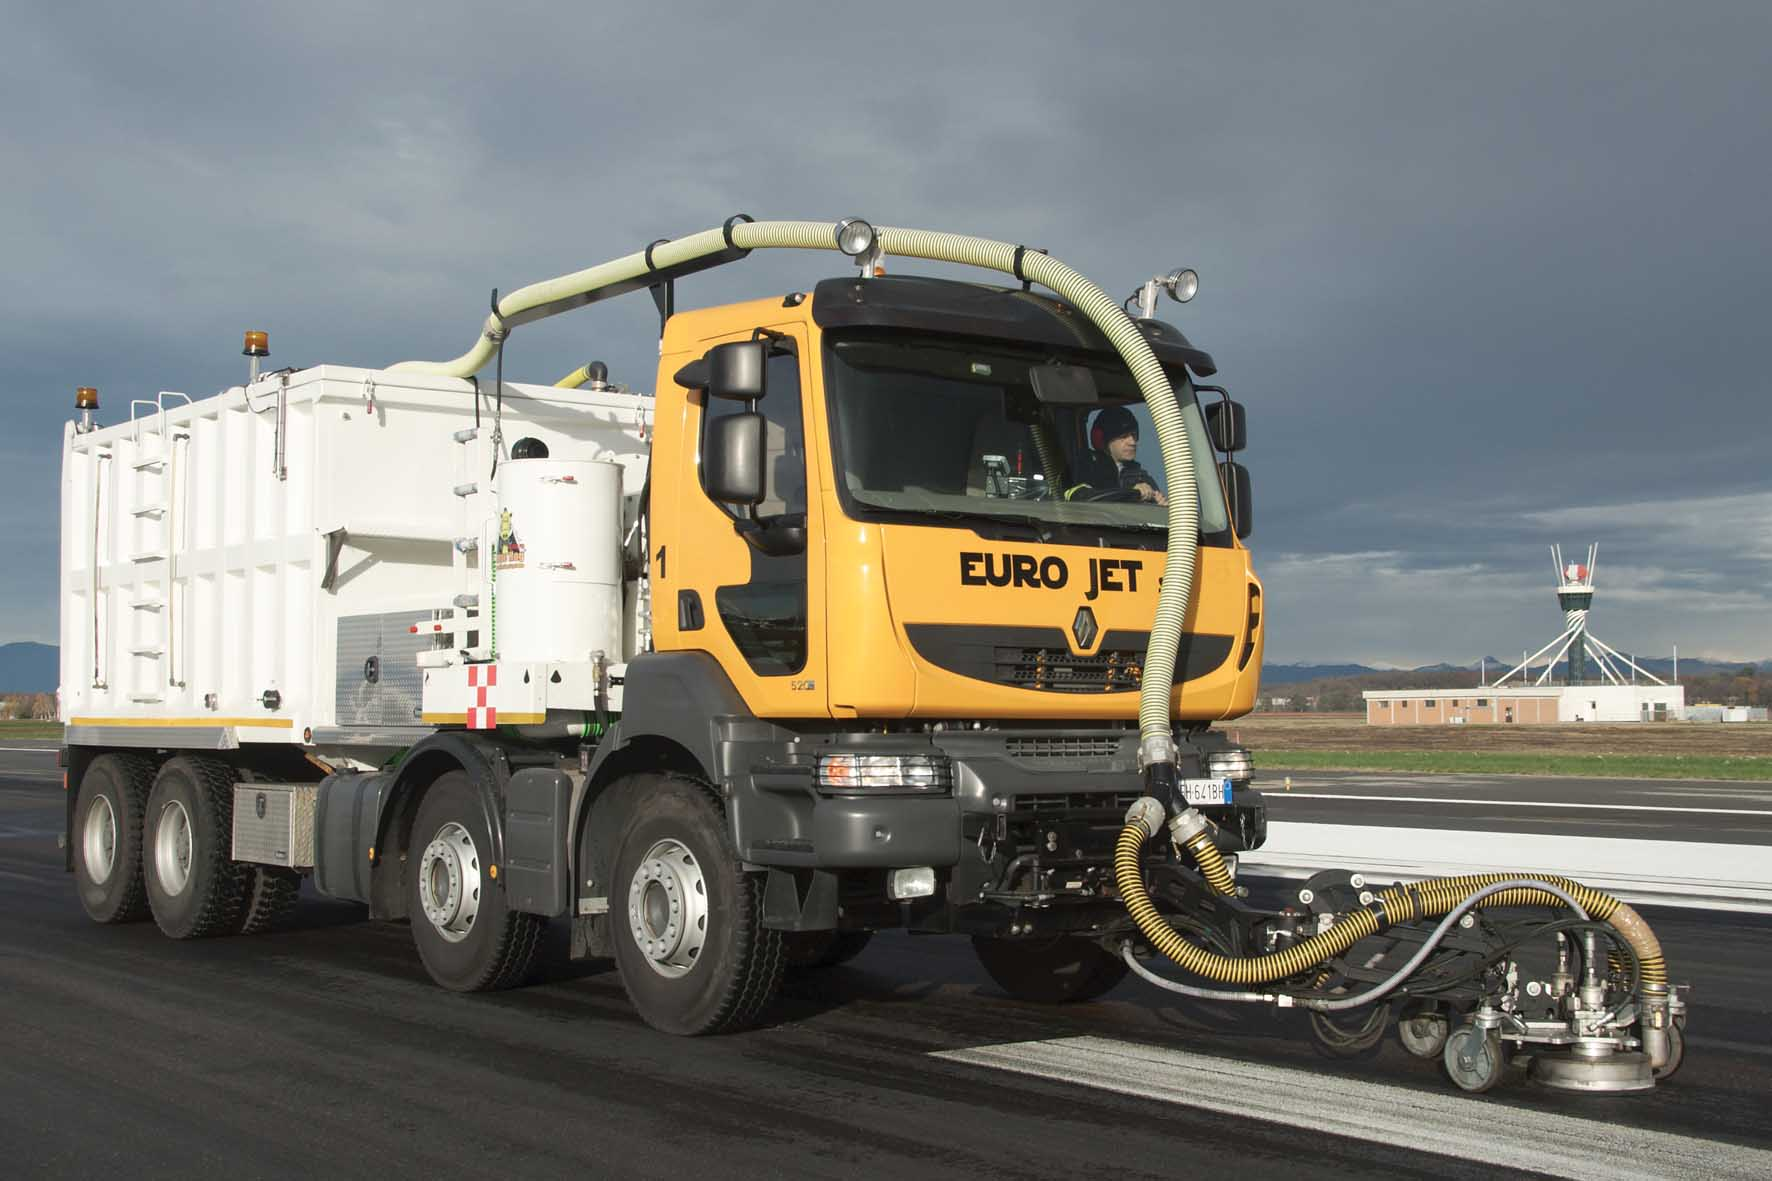 Renault Trucks Euro Jet pulizia gomma piste aeroportuali 1